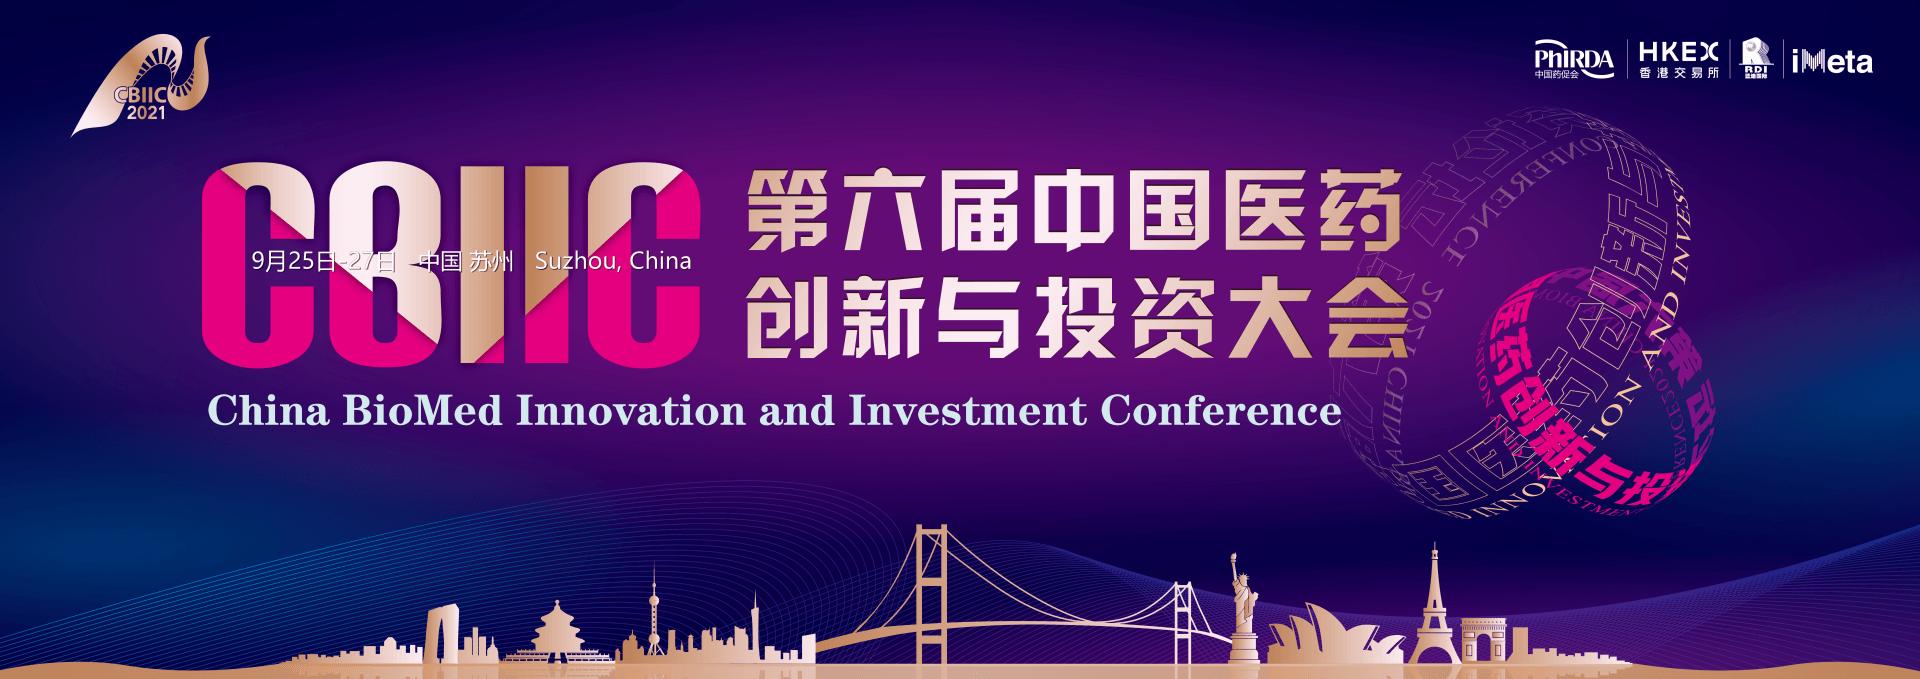 2021CBIIC第六屆中國醫藥創新與投資大會